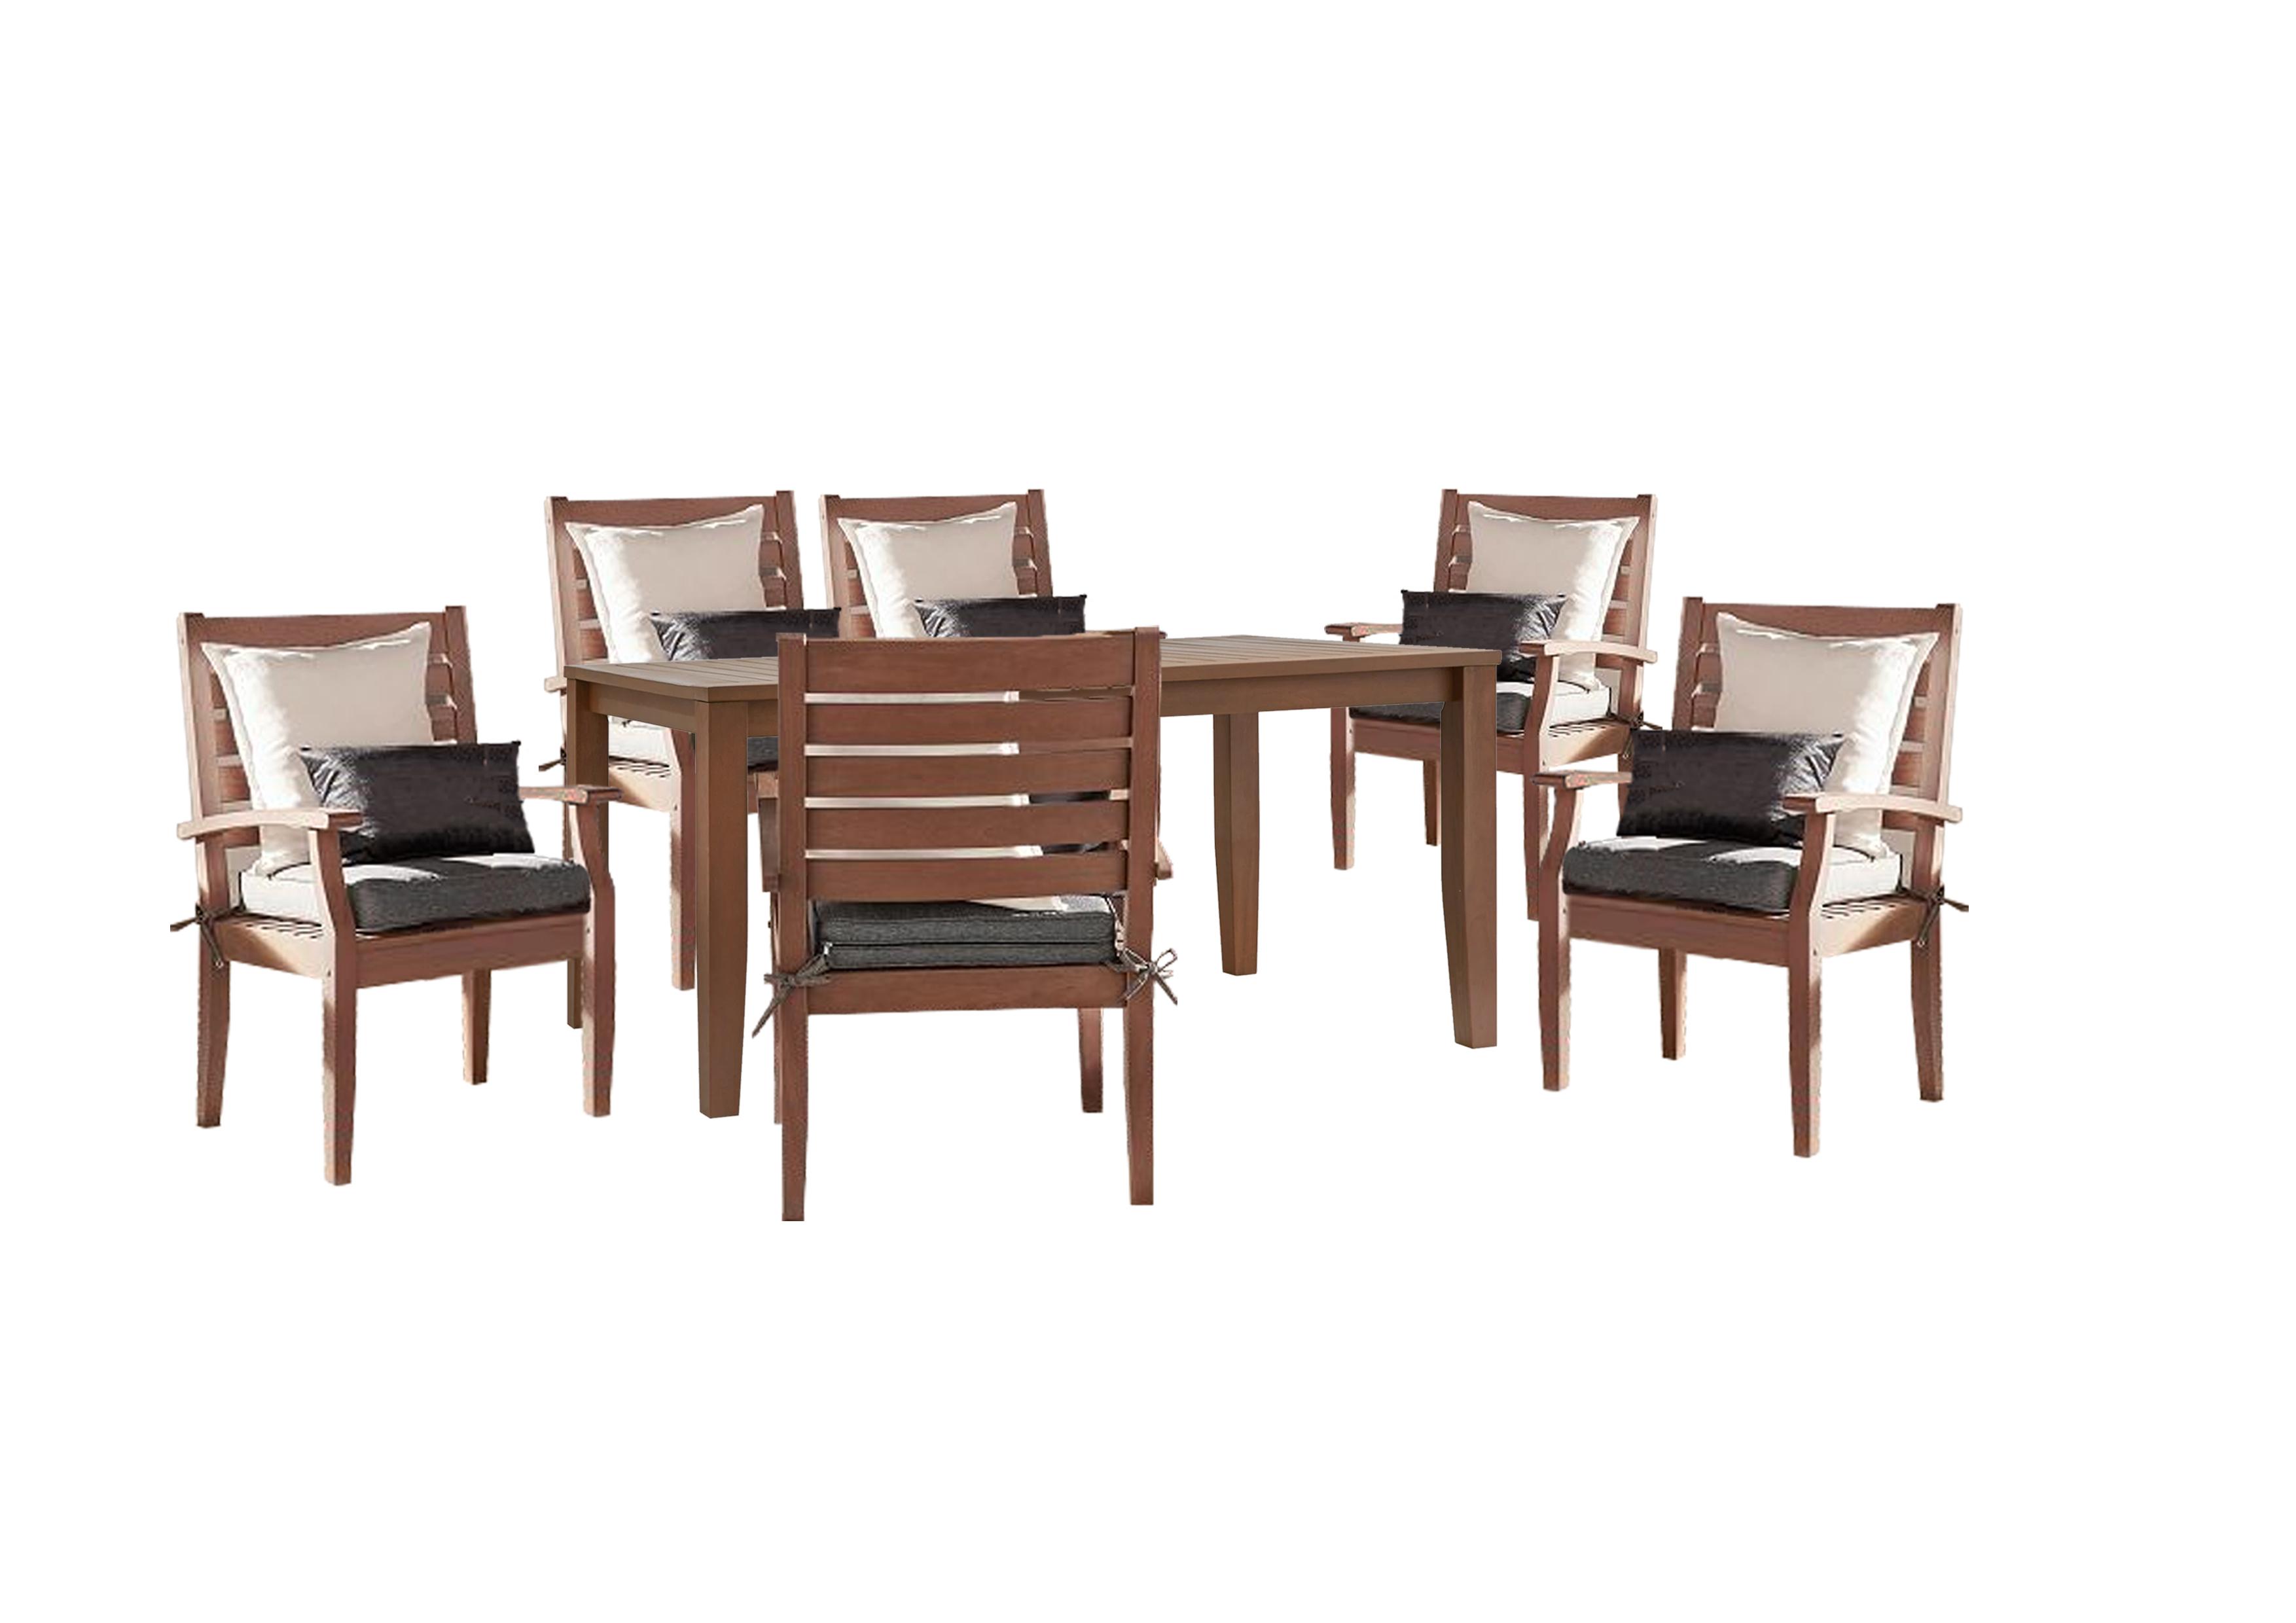 Cypress Outdoor Dining Set.jpg